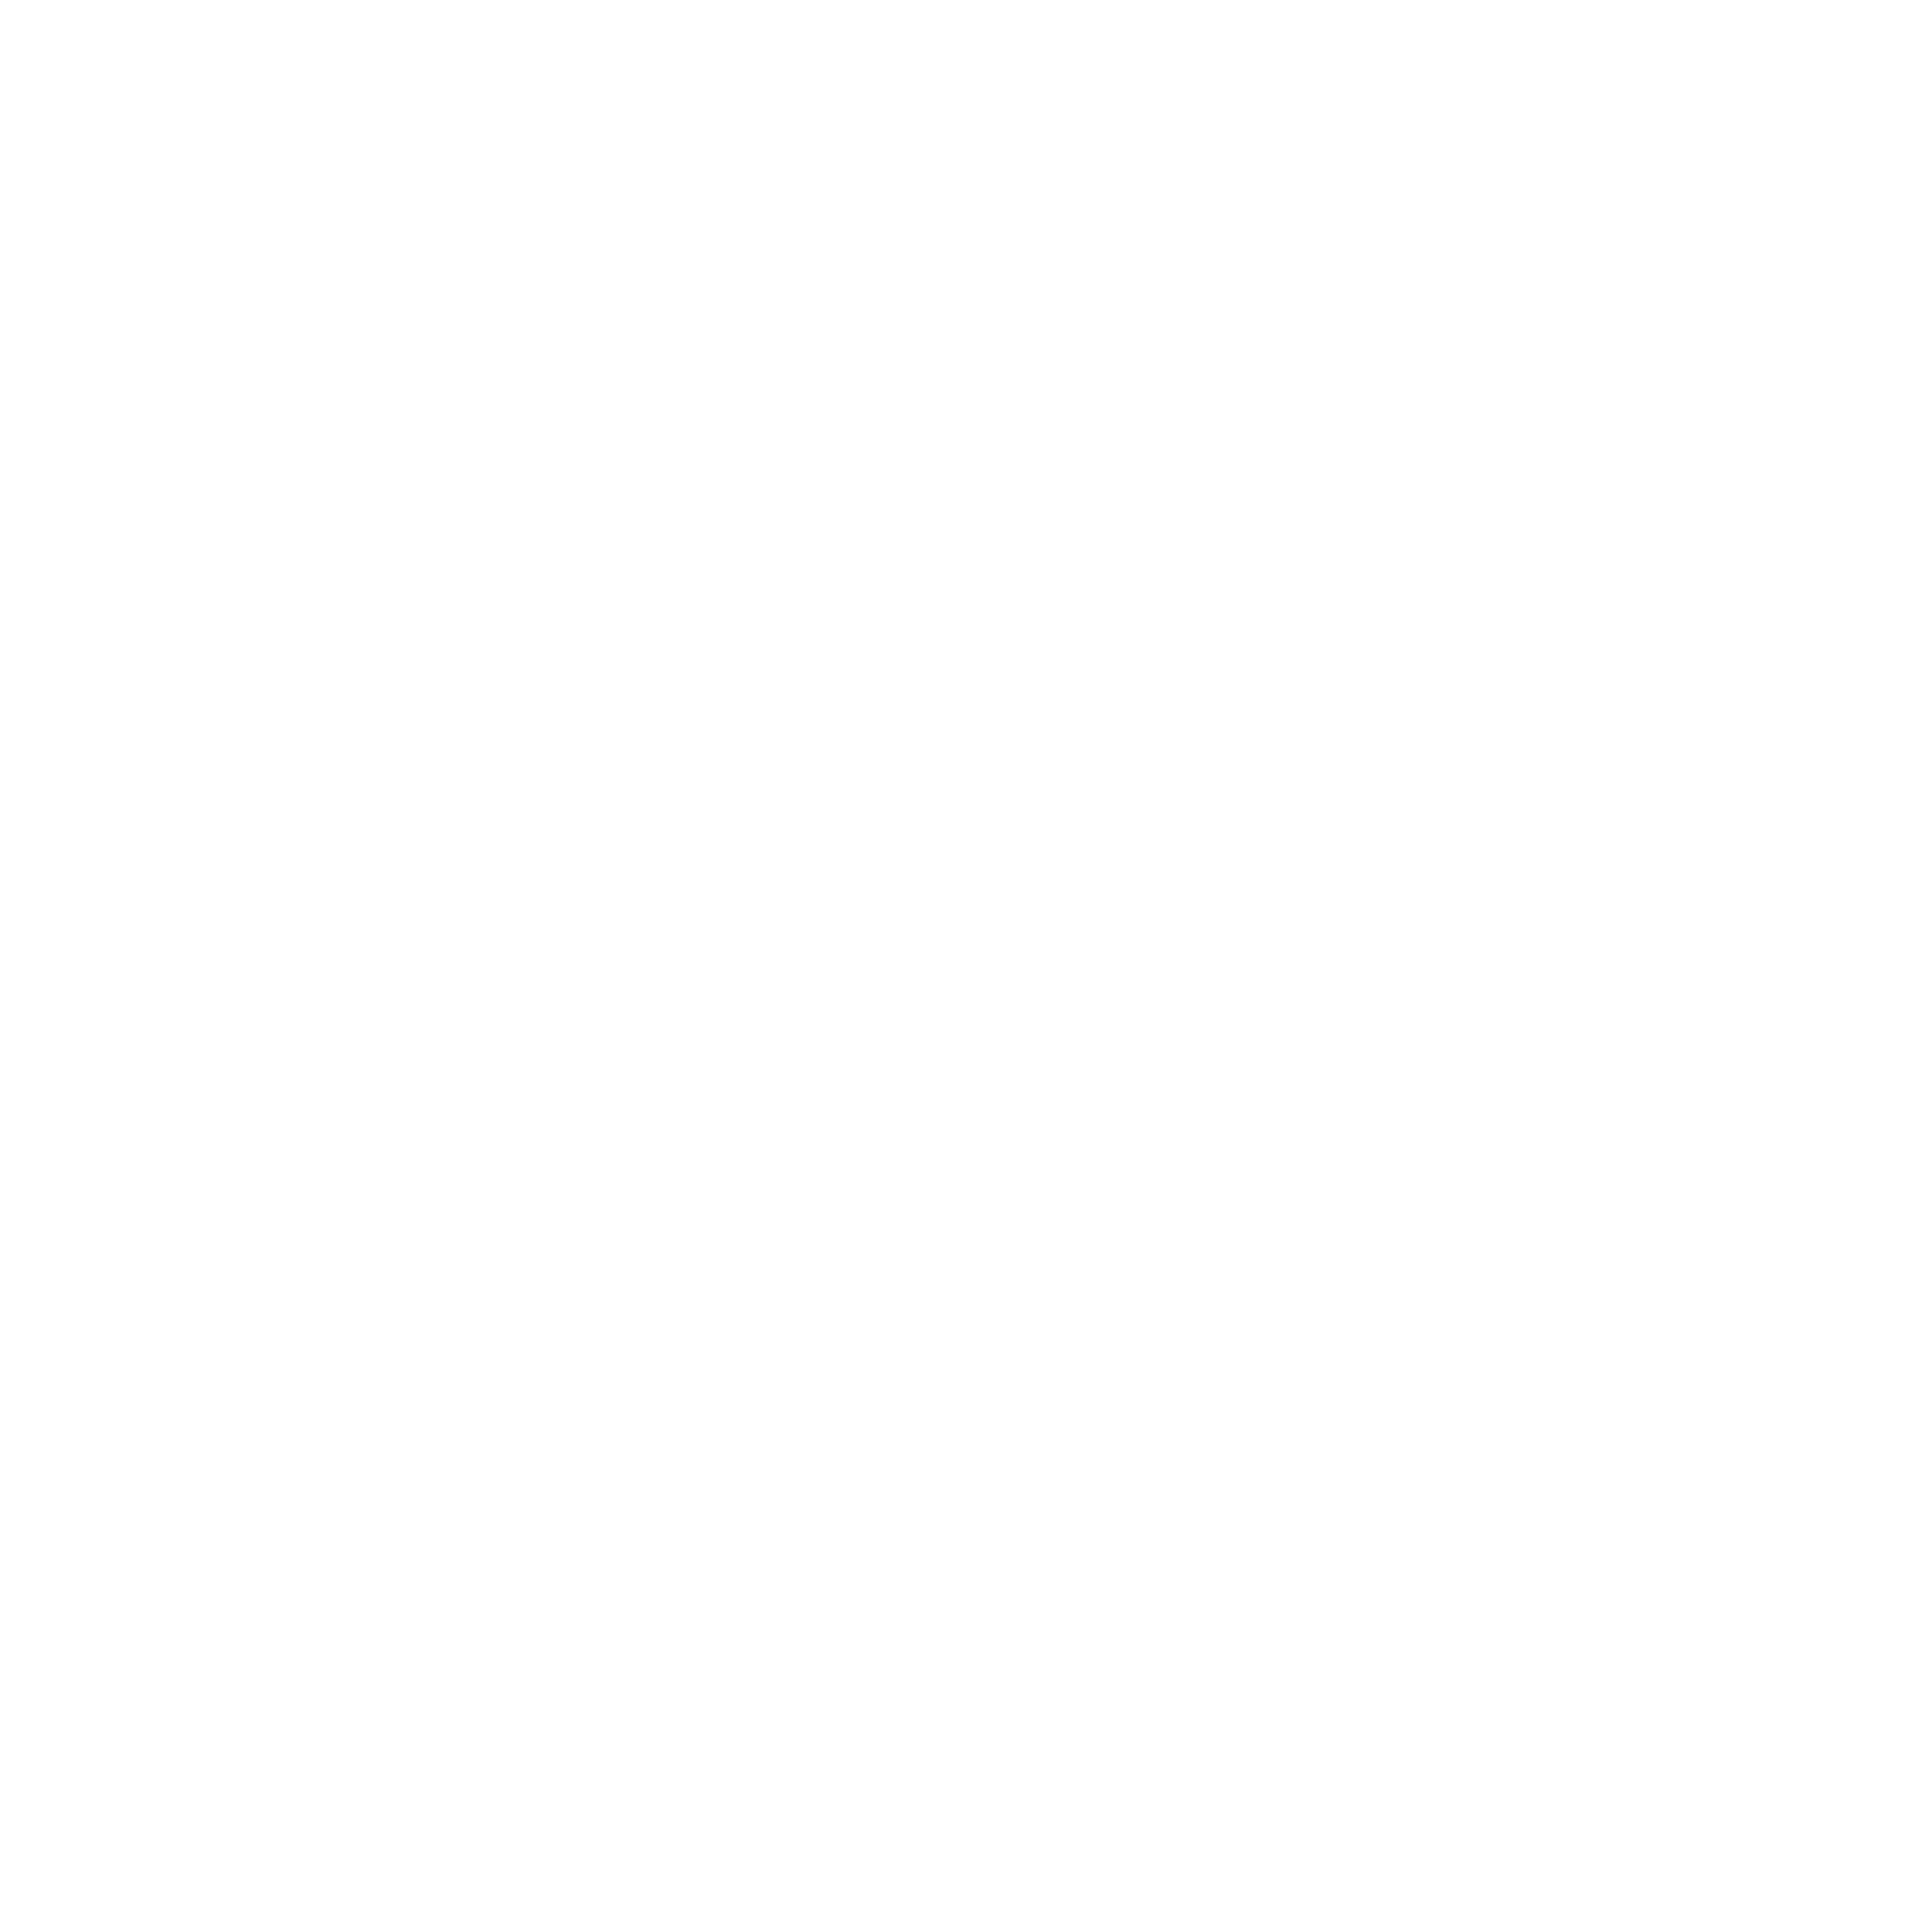 M430 Eventing